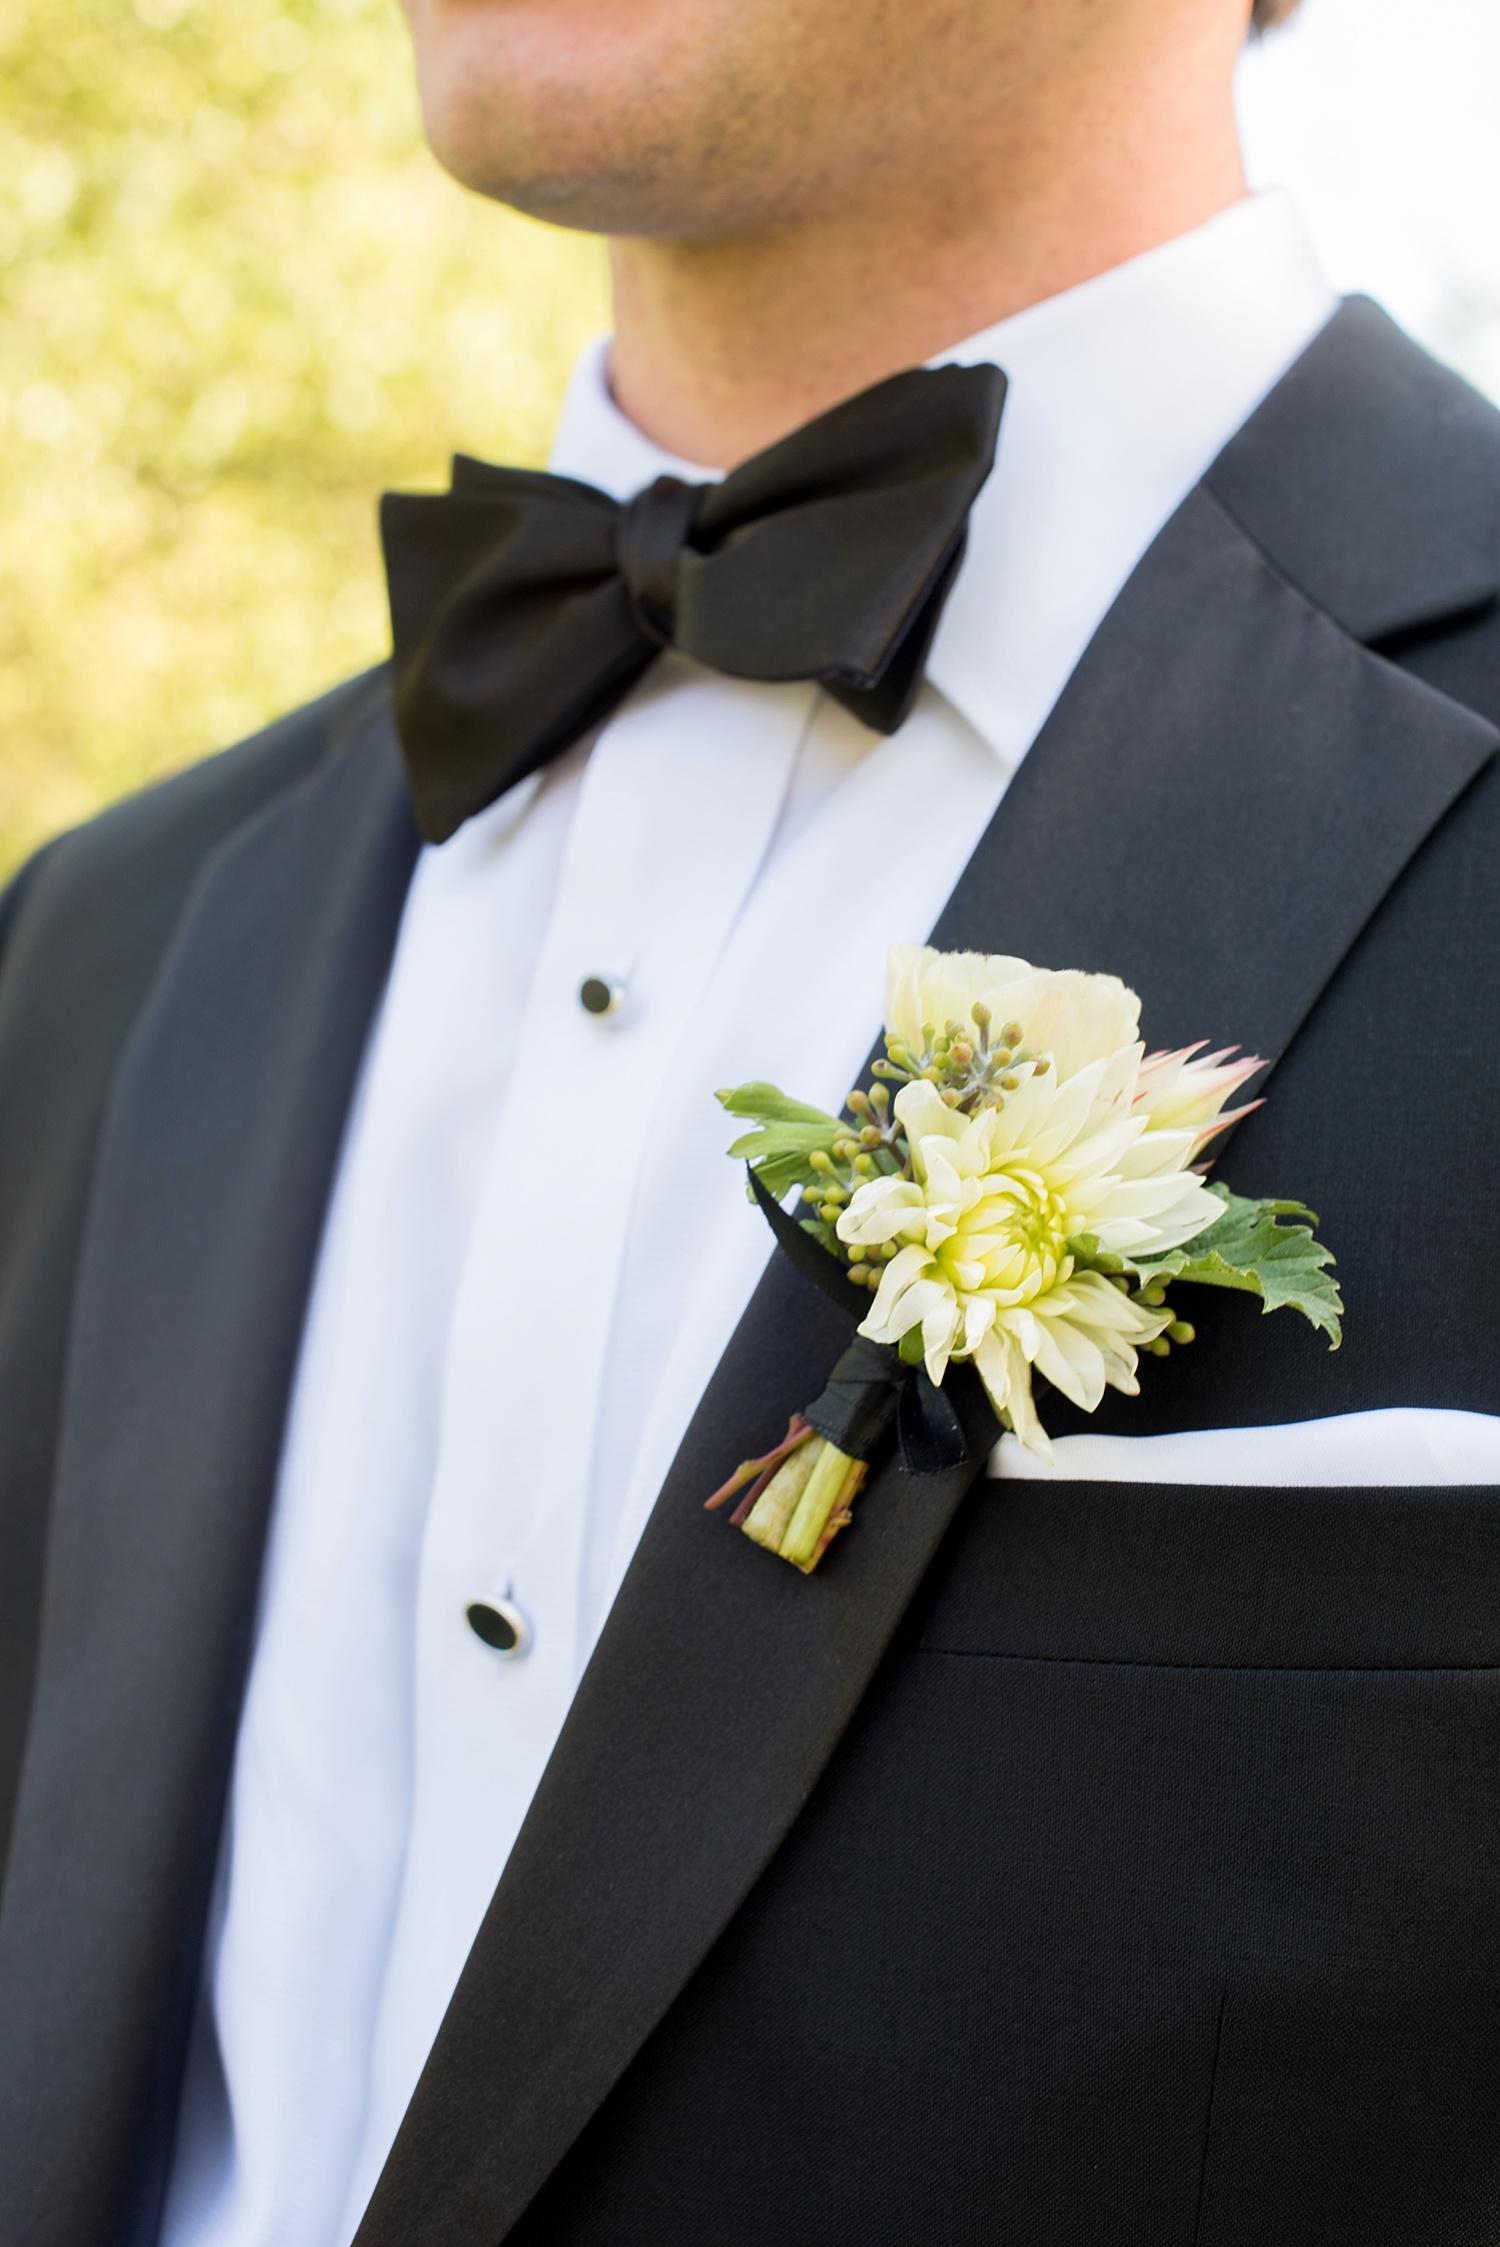 mikkelpaige-full_aperture_floral-pearl_river_hilton_wedding_0008.jpg